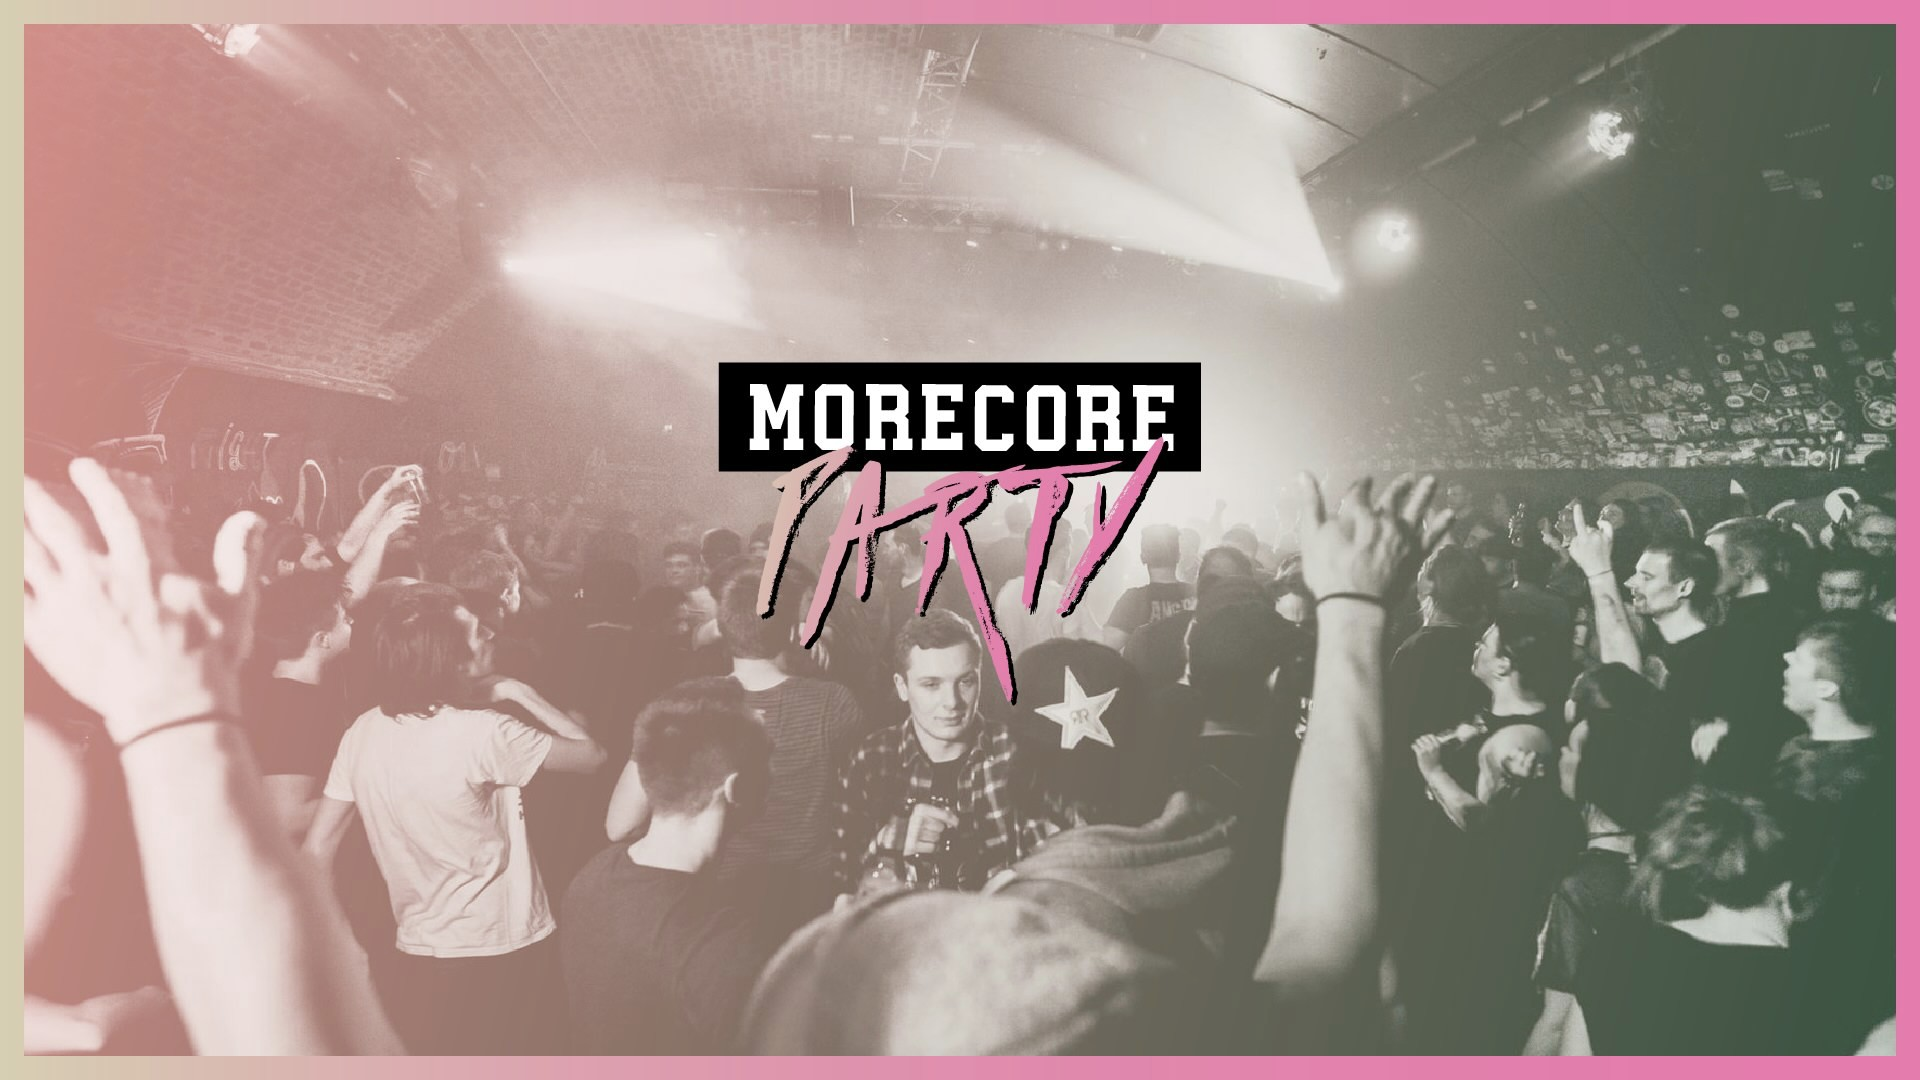 MoreCore Party Köln